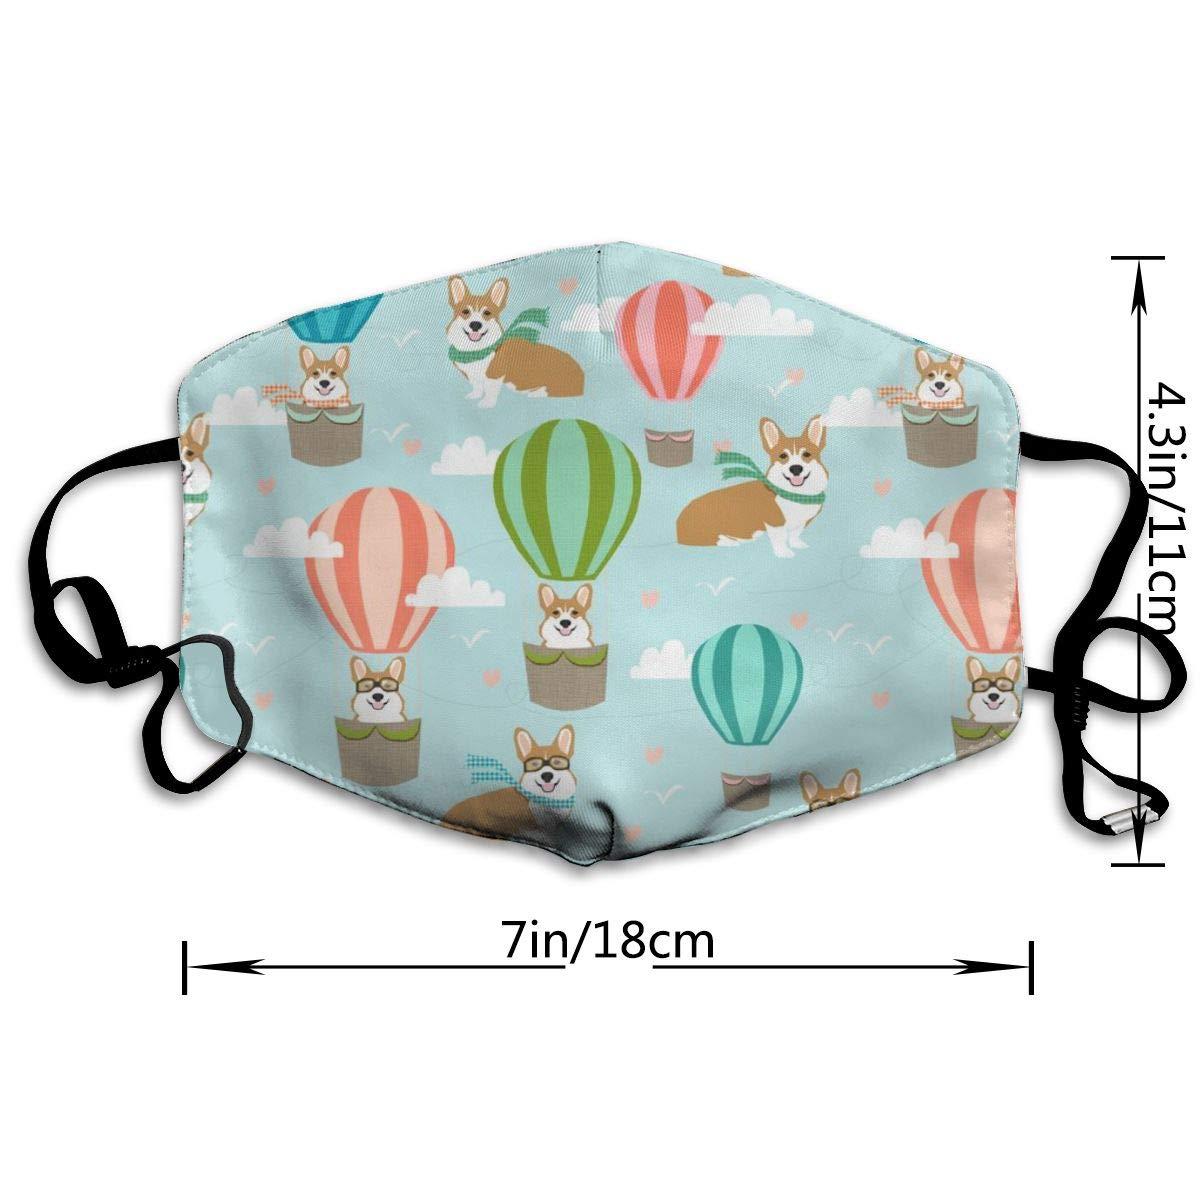 Work Safety Equipment & Gear Corgi Hot Air Balloon Cute Corgis In Hot Air Balloons Anti-dust Cotton Mouth Face Masks Reusable for Outdoor Half Face Masks